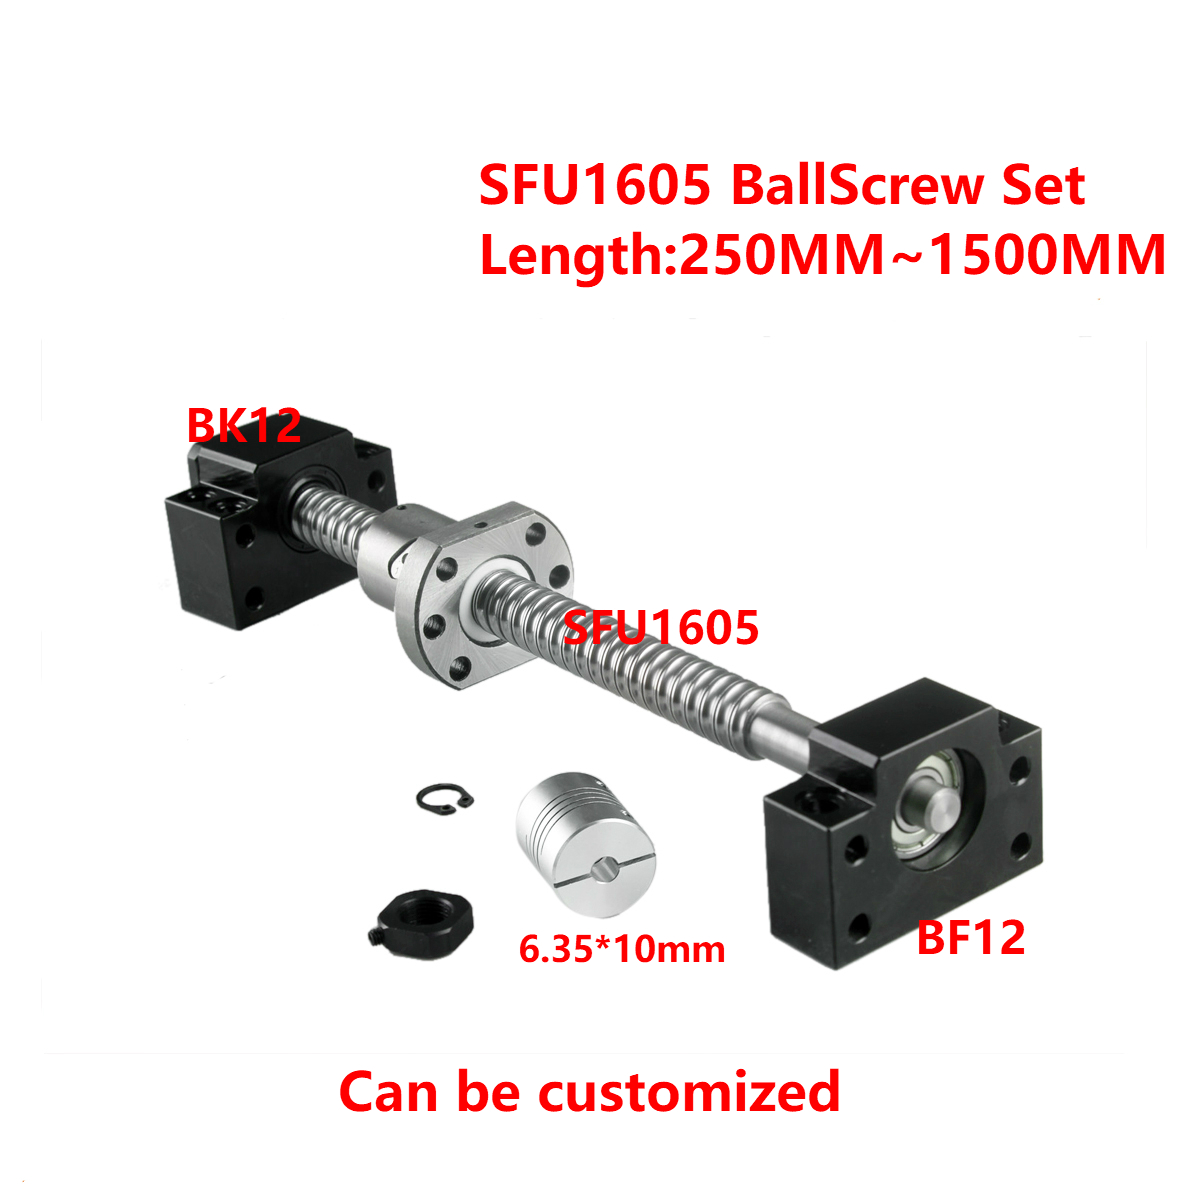 Vis à billes SFU1605-250 300 350 400 450 500 600 650 700 900 1000mm Fin Machine & BK12 BF12 + 6.35x10mm Coupleur Ensemble